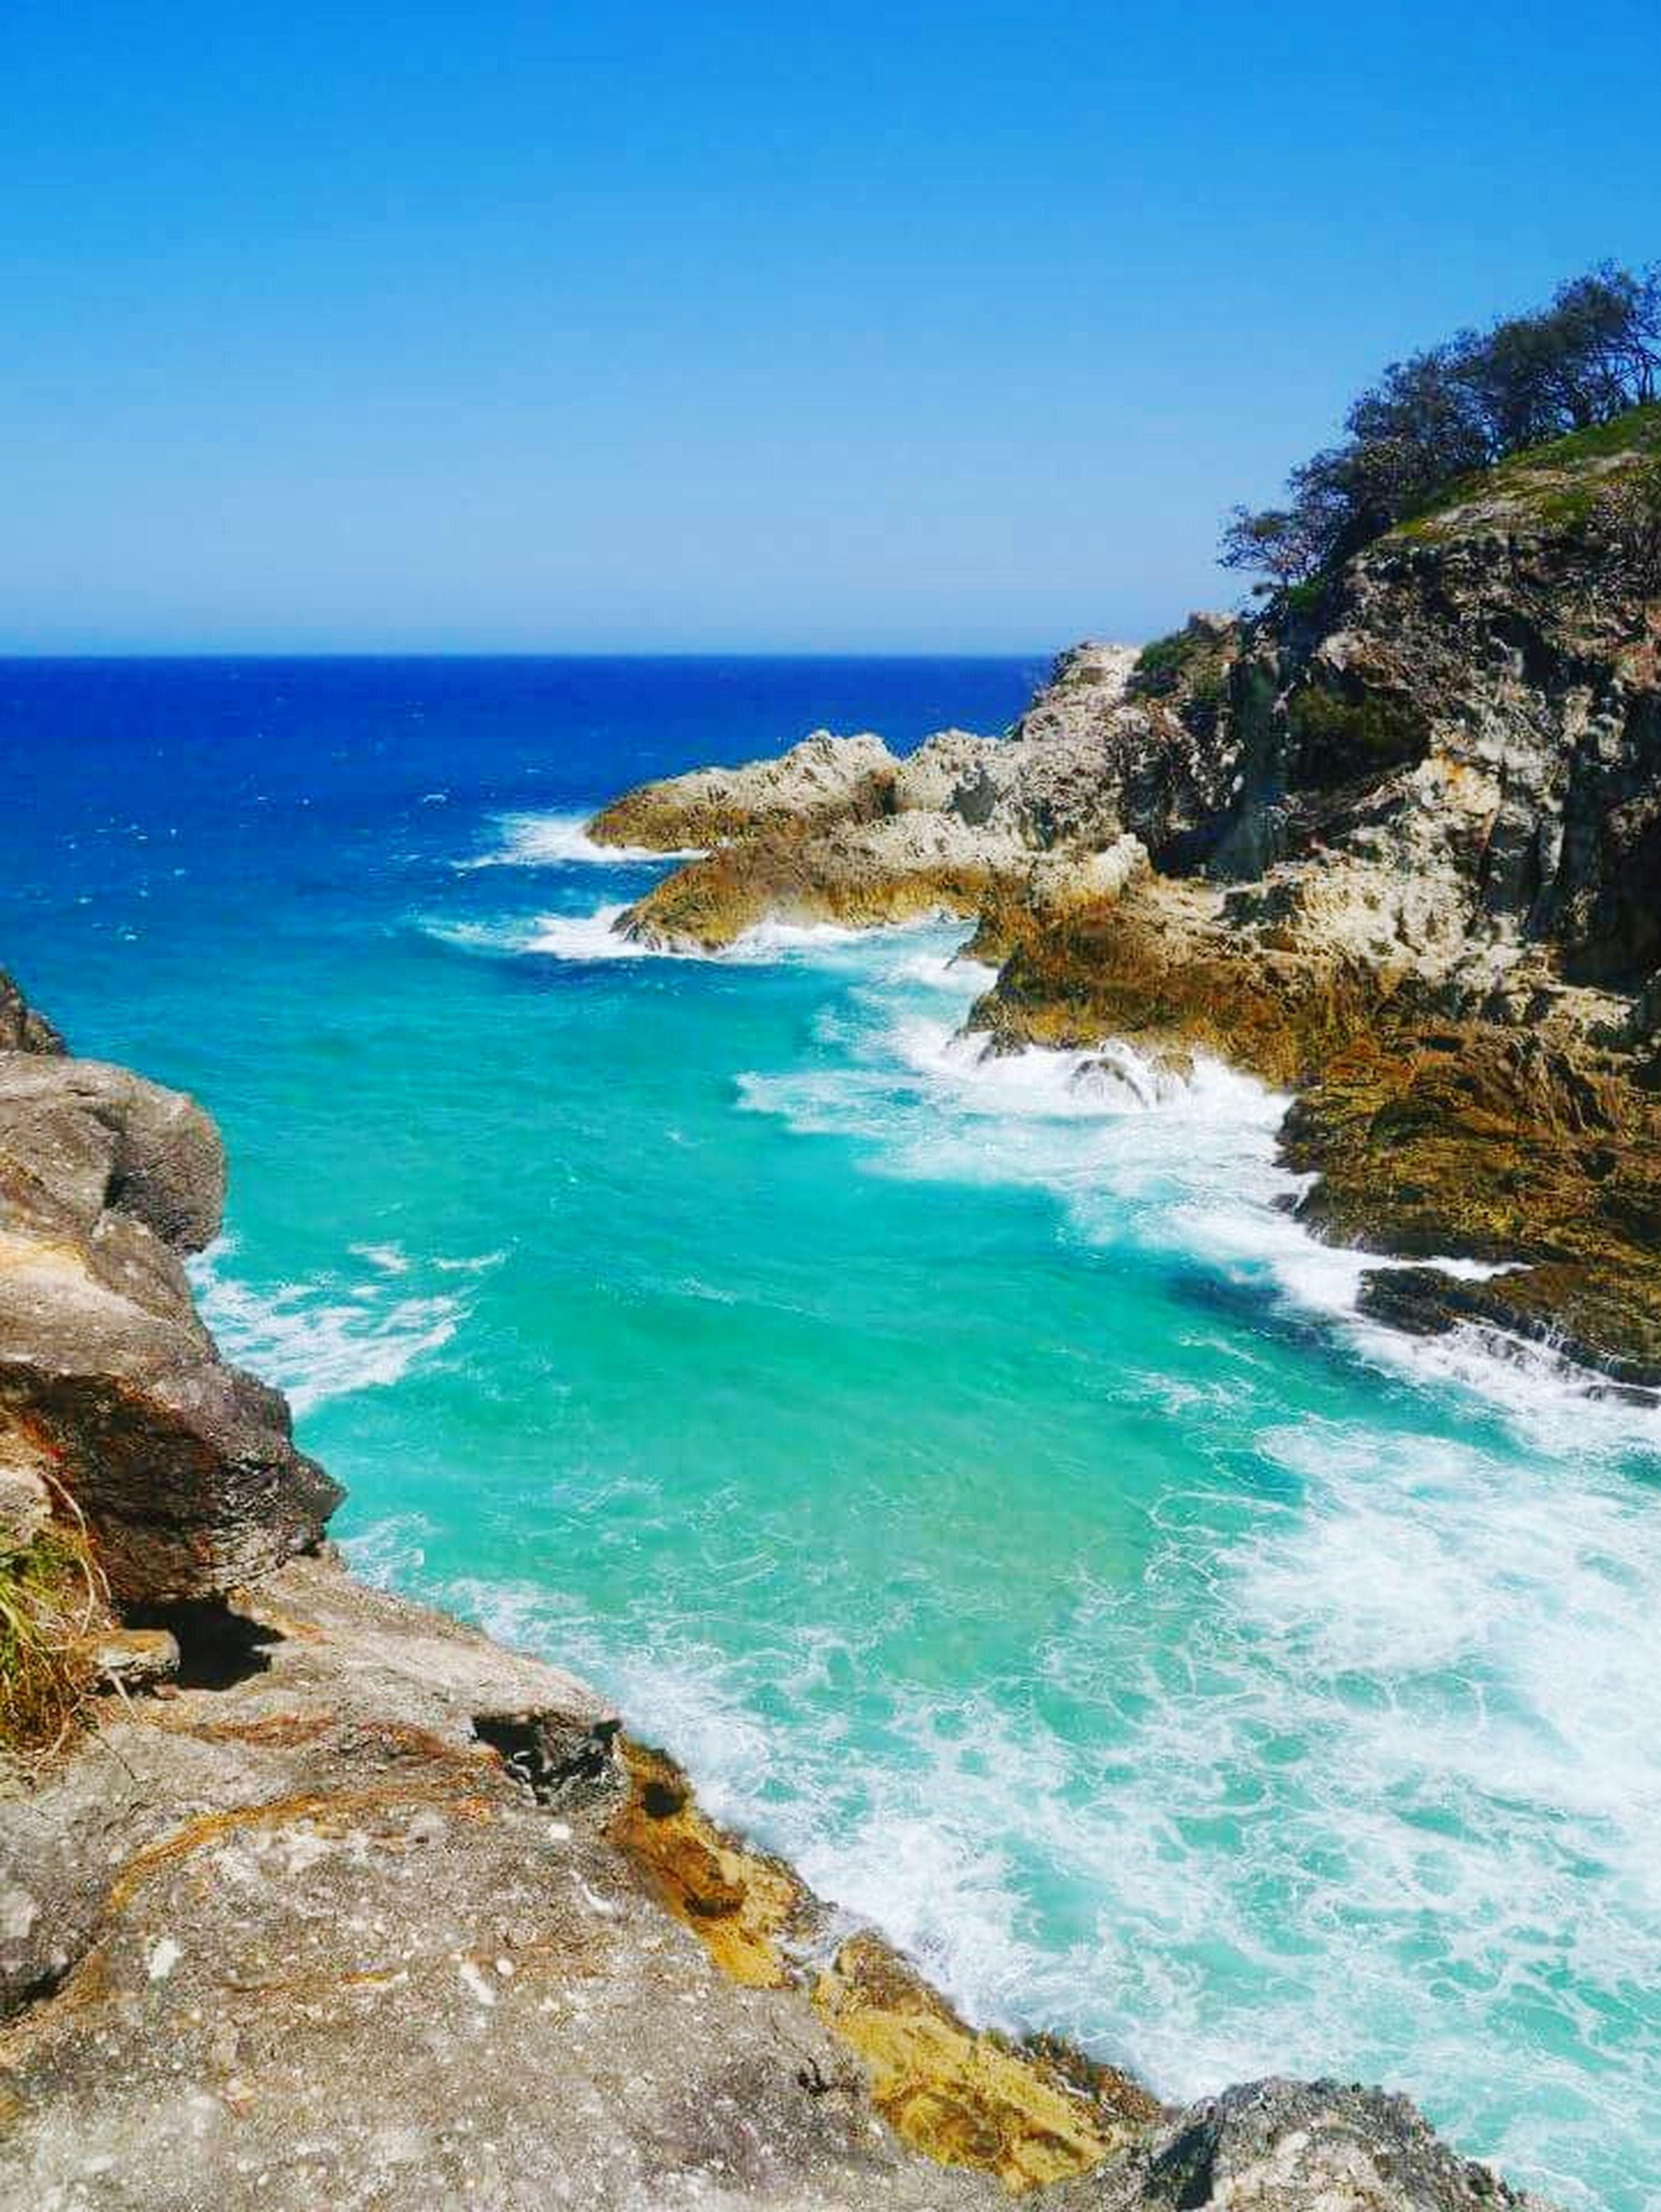 sea, water, horizon over water, blue, clear sky, scenics, tranquil scene, beauty in nature, rock - object, tranquility, rock formation, nature, rock, copy space, idyllic, cliff, coastline, shore, day, sky